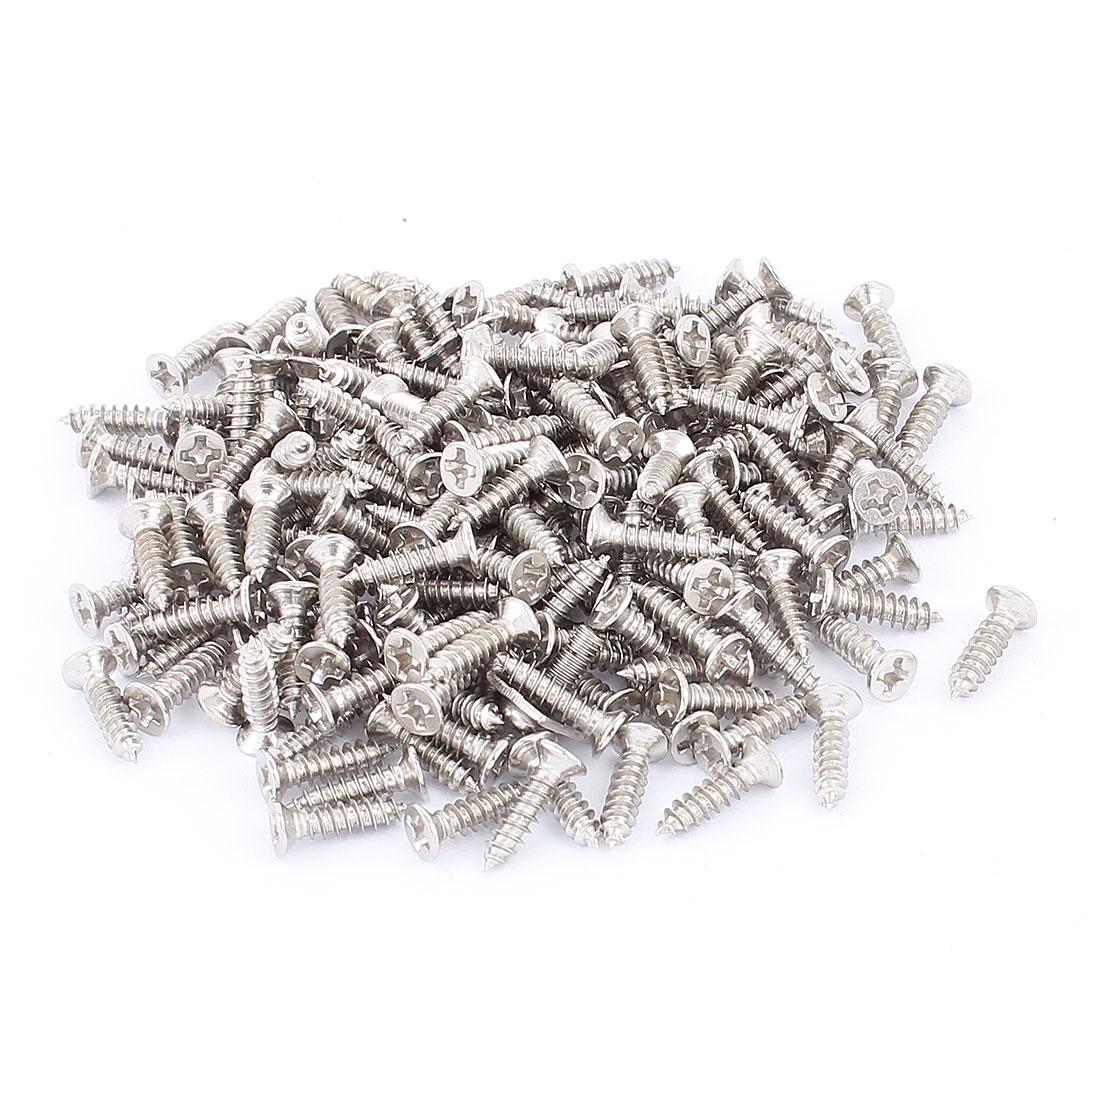 M3 x 11mm Stainless Steel Phillips Truss Plain Head Self Tapping Screws 200pcs